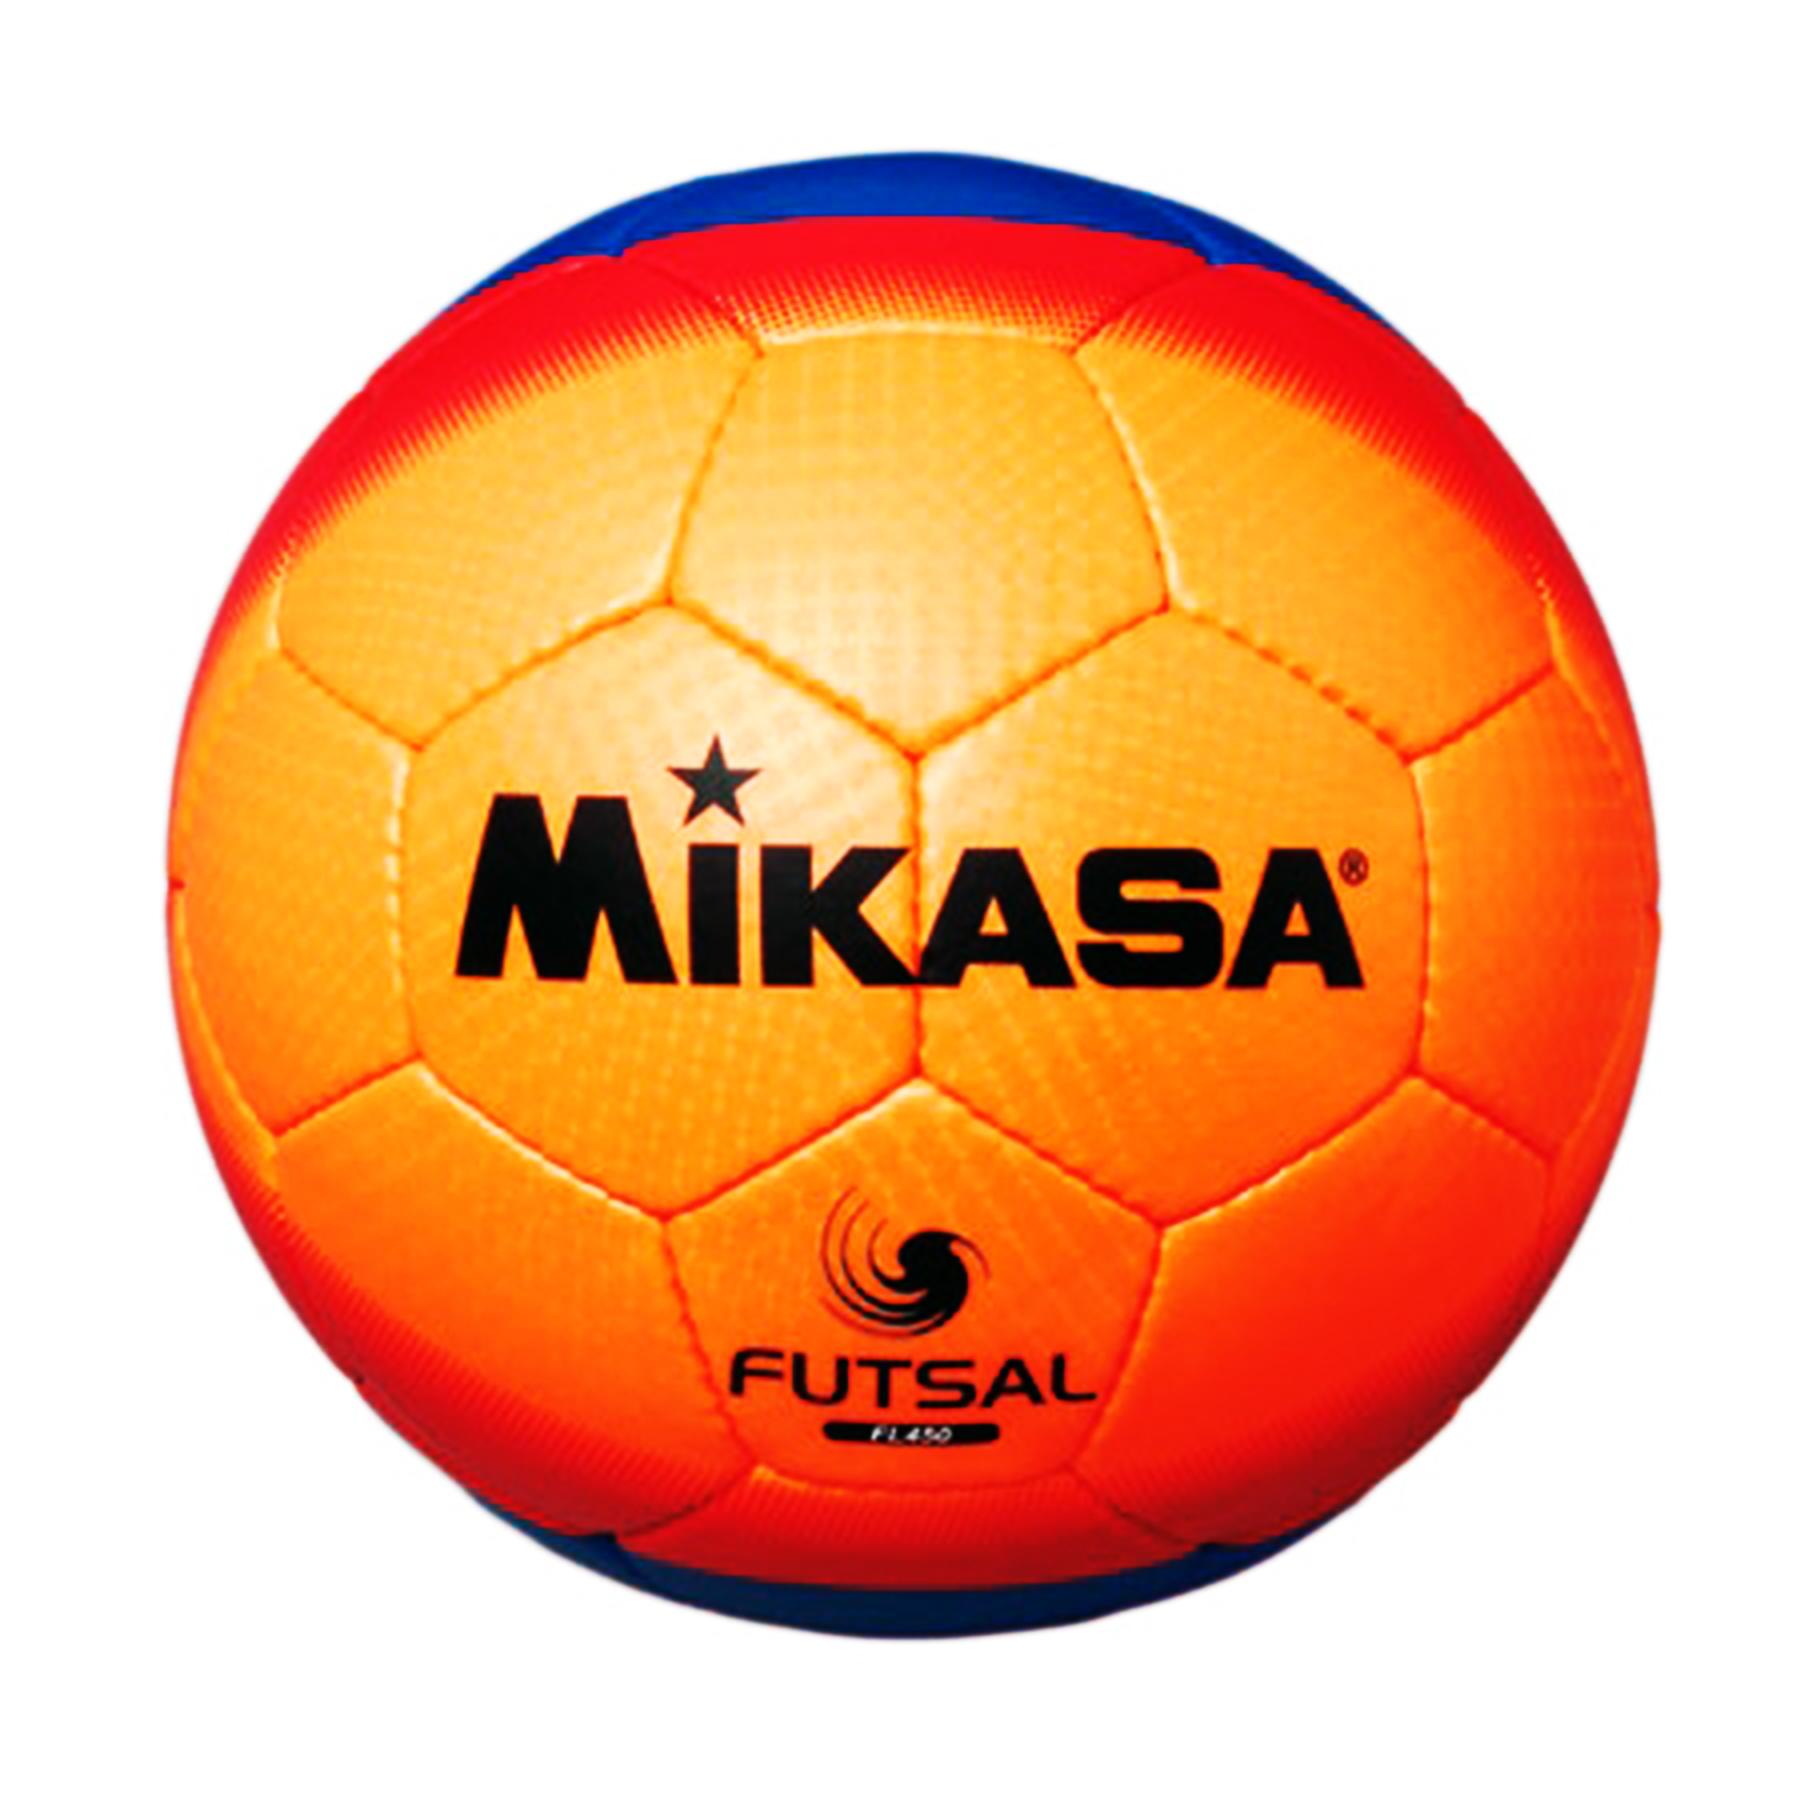 Мяч ф/б Микаса минифутбол FL 450 ОRB №4 низк отскок оранж-крас-синий